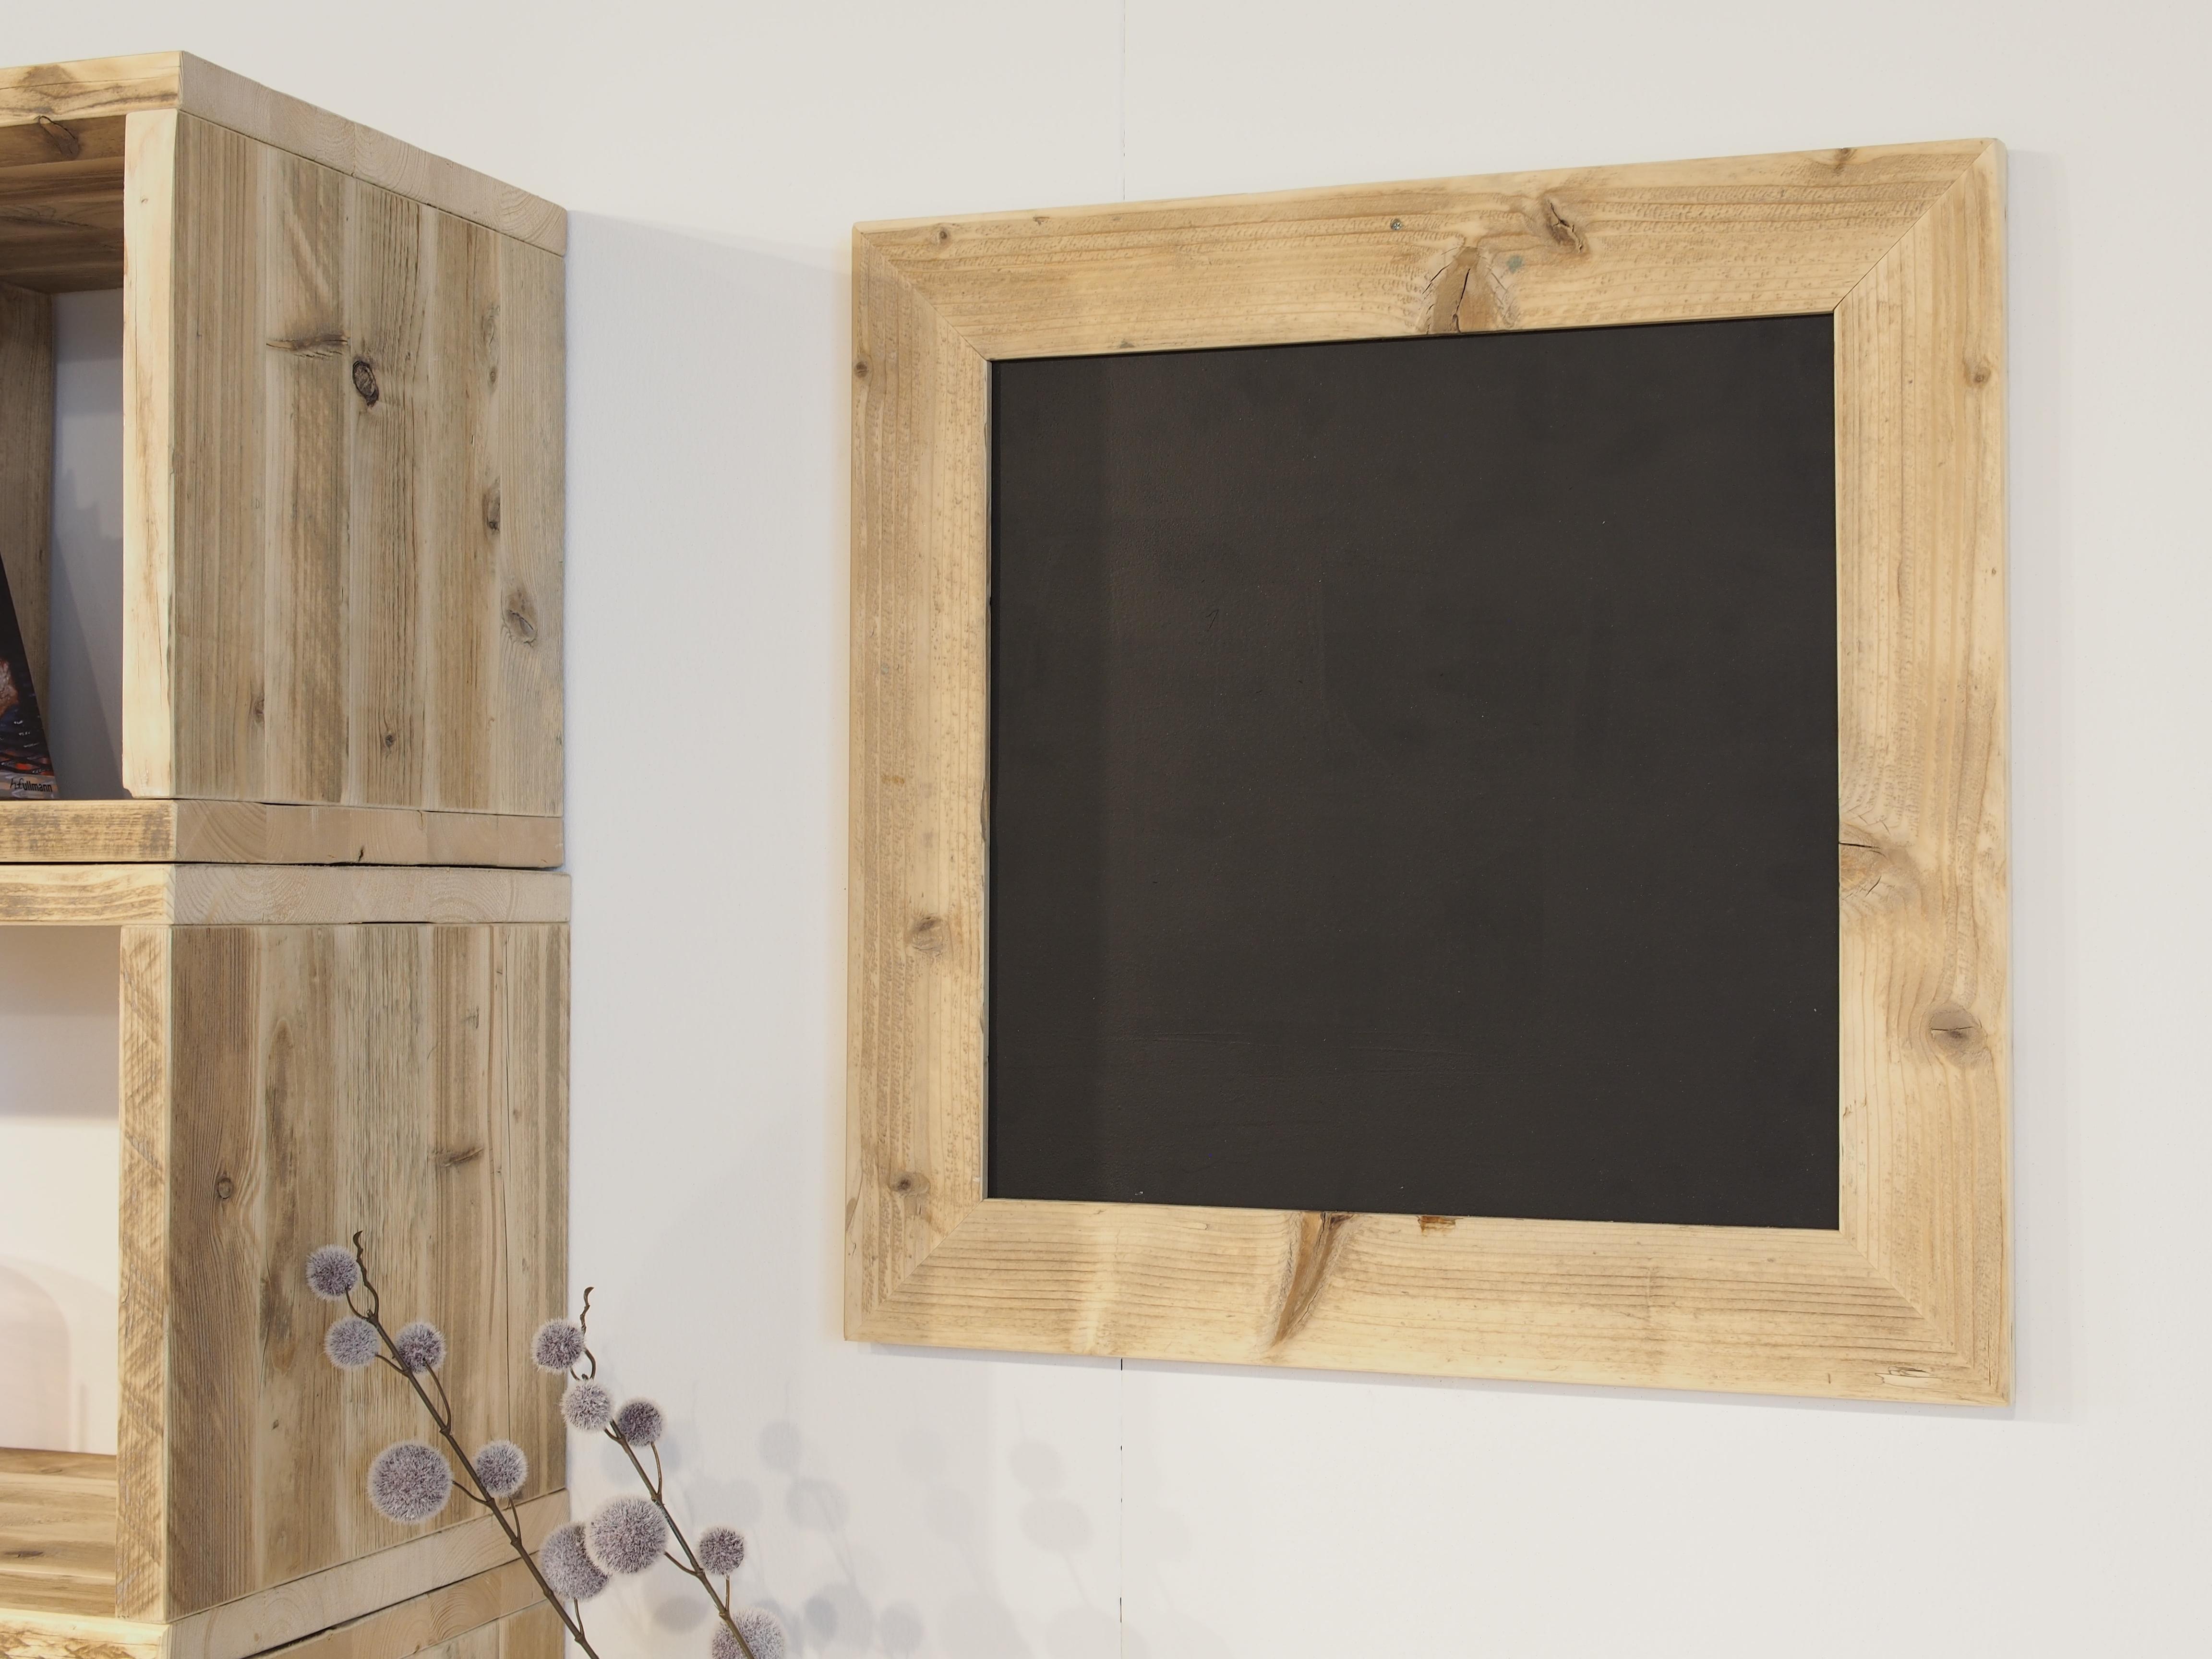 Tafel mit Bauholzrahmen 65 cm x 85 cm